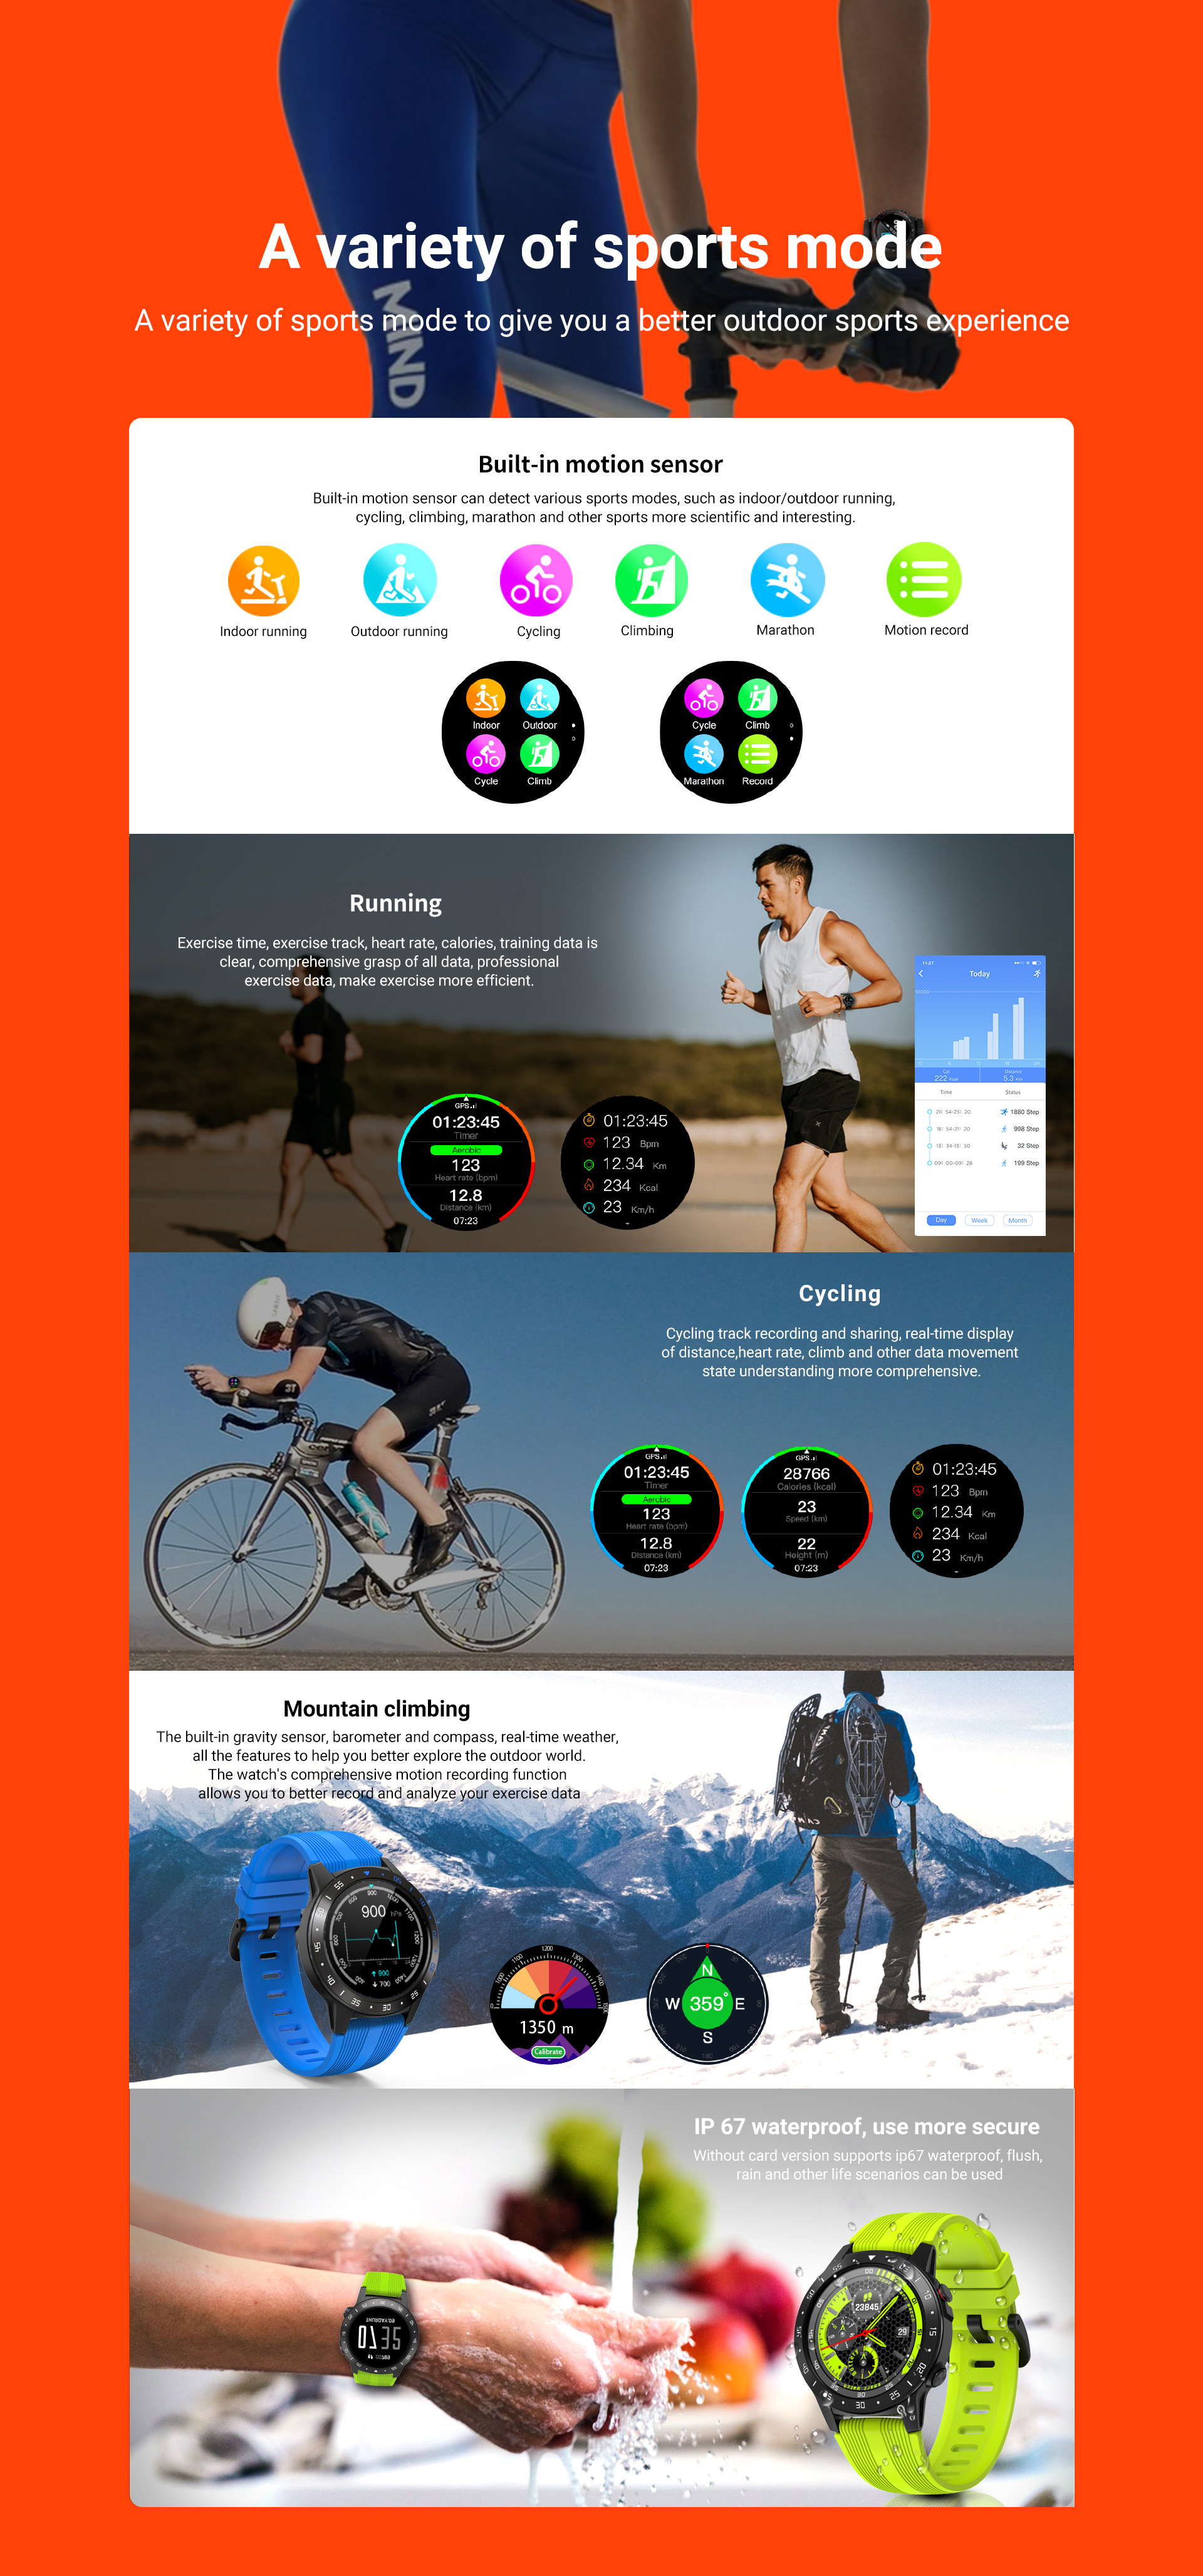 H130b446a08f647e1b716e2d55df2ad90I GPS Smartwatch Men With SIM Card Fitness Compass Barometer Altitude M5 Mi Smart Watch Men Women 2021 for Android Xiaomi